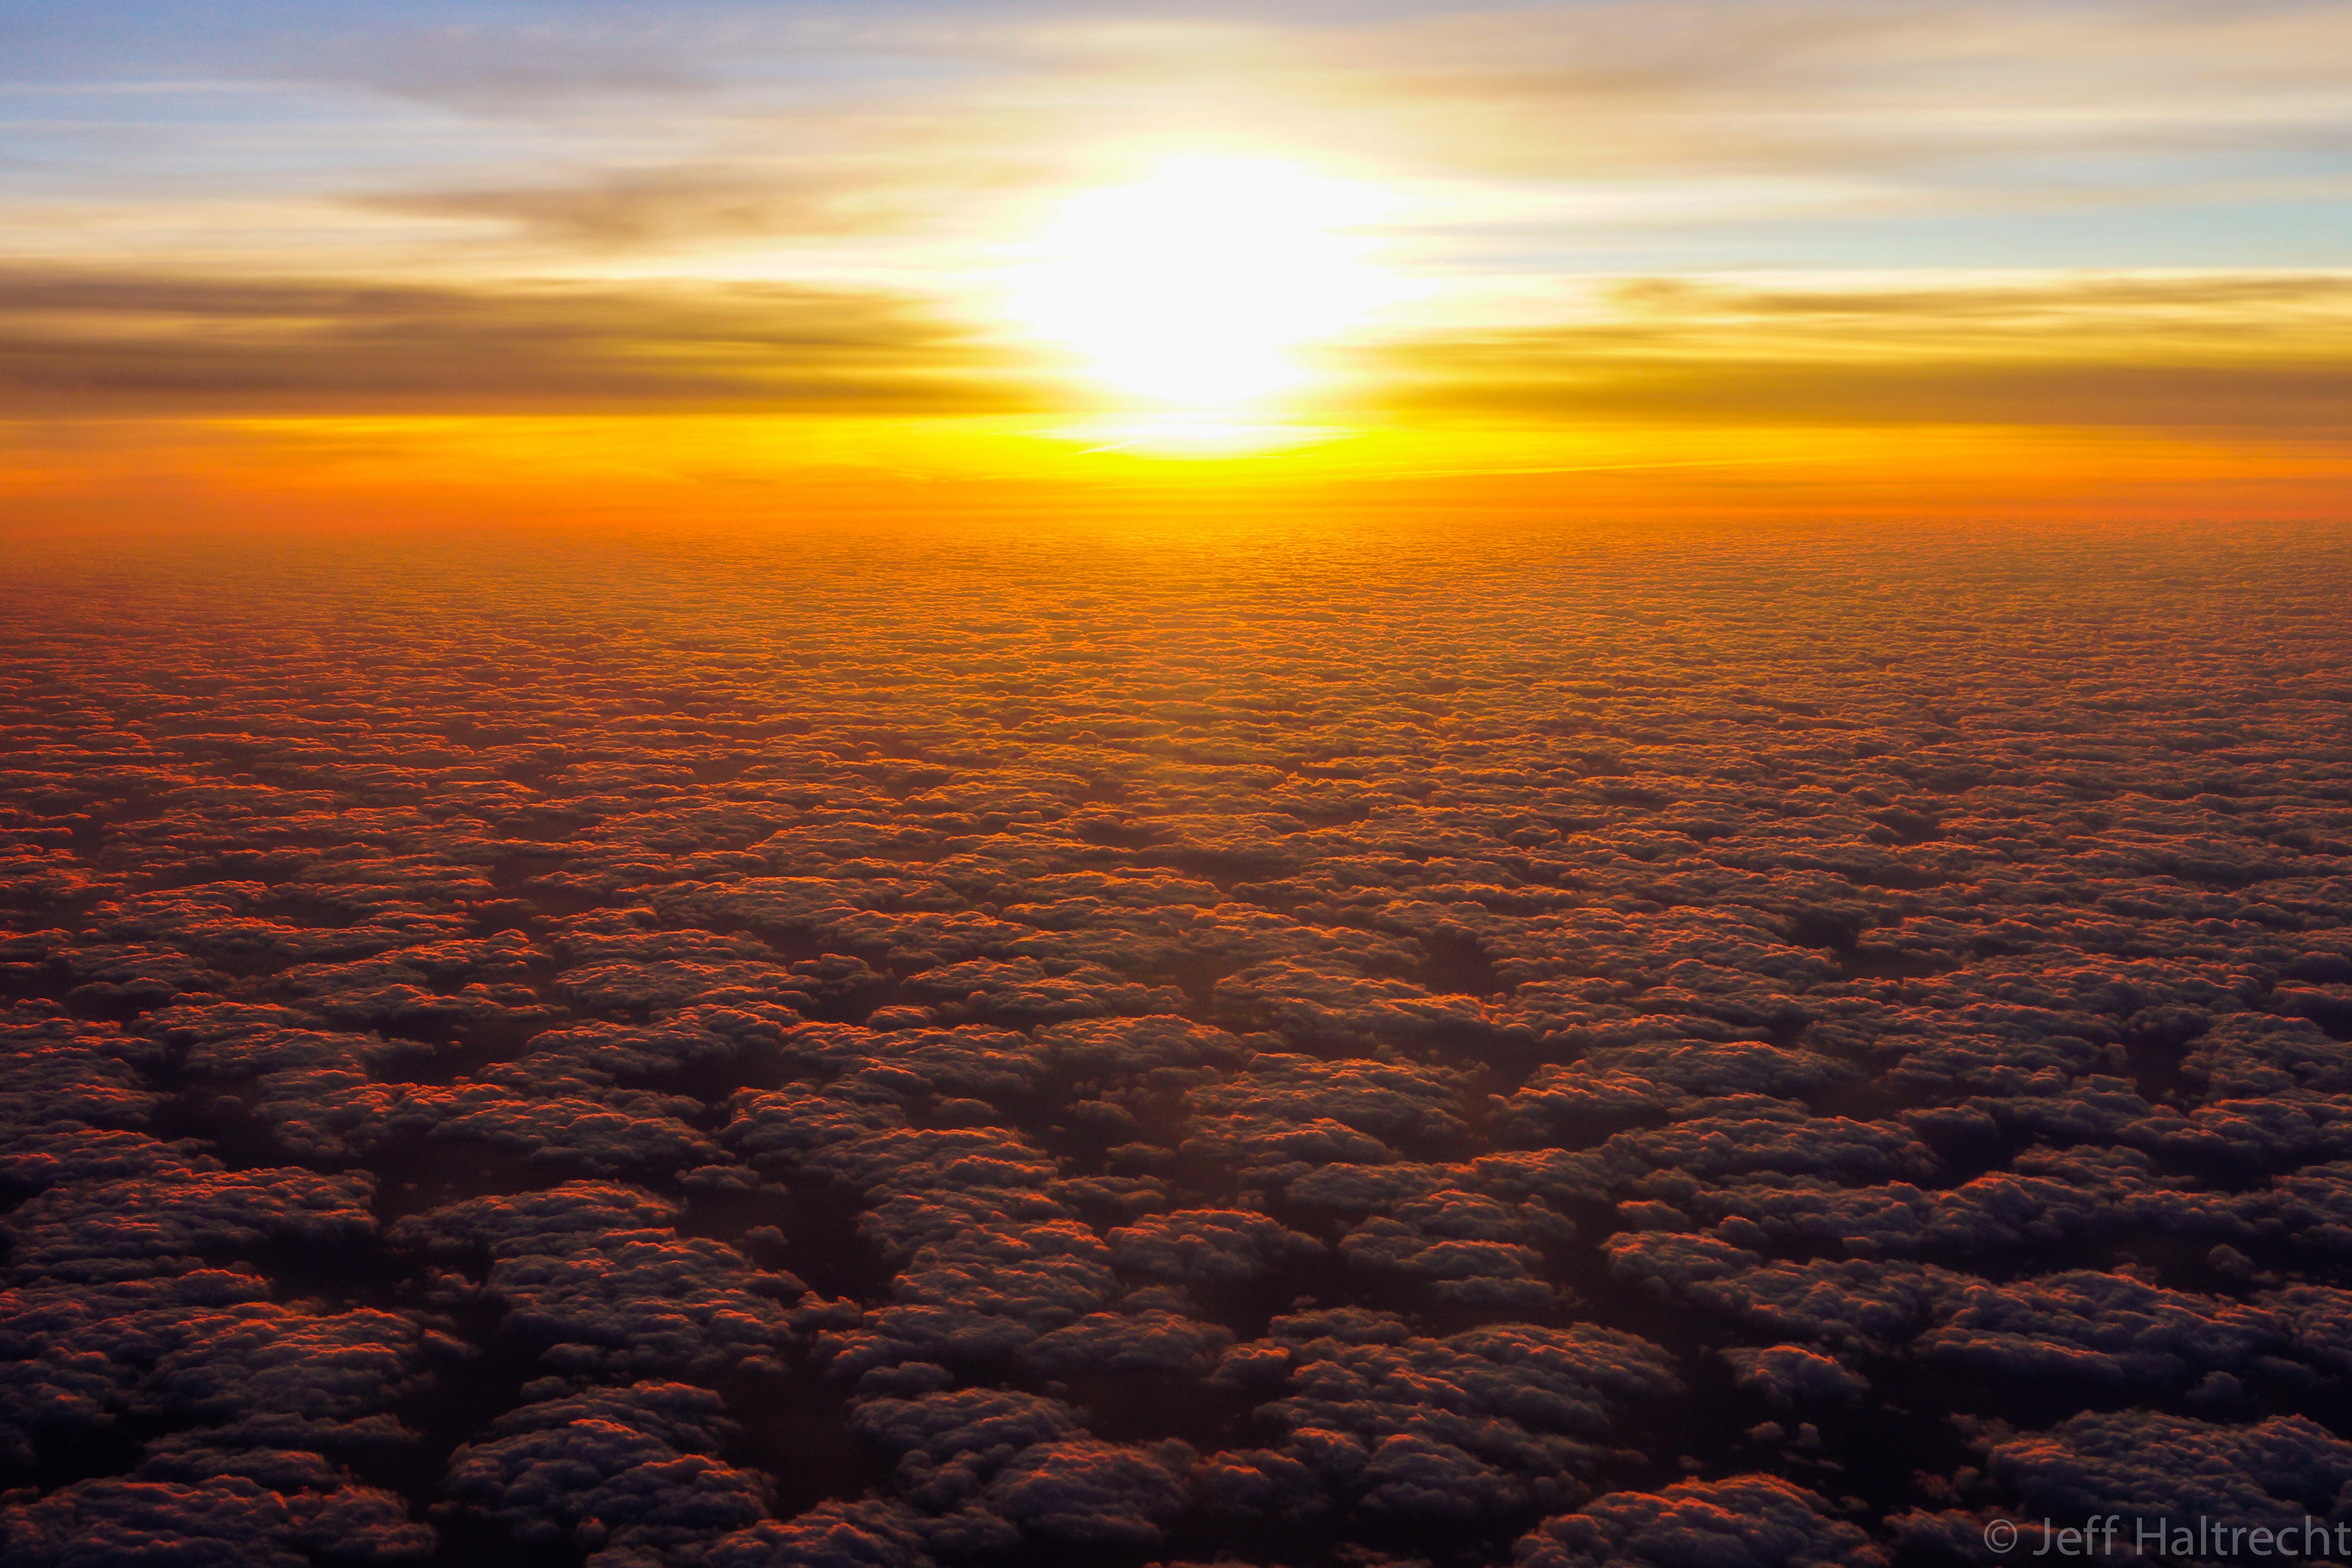 sunset at thirty five thousand feet on way to aruba